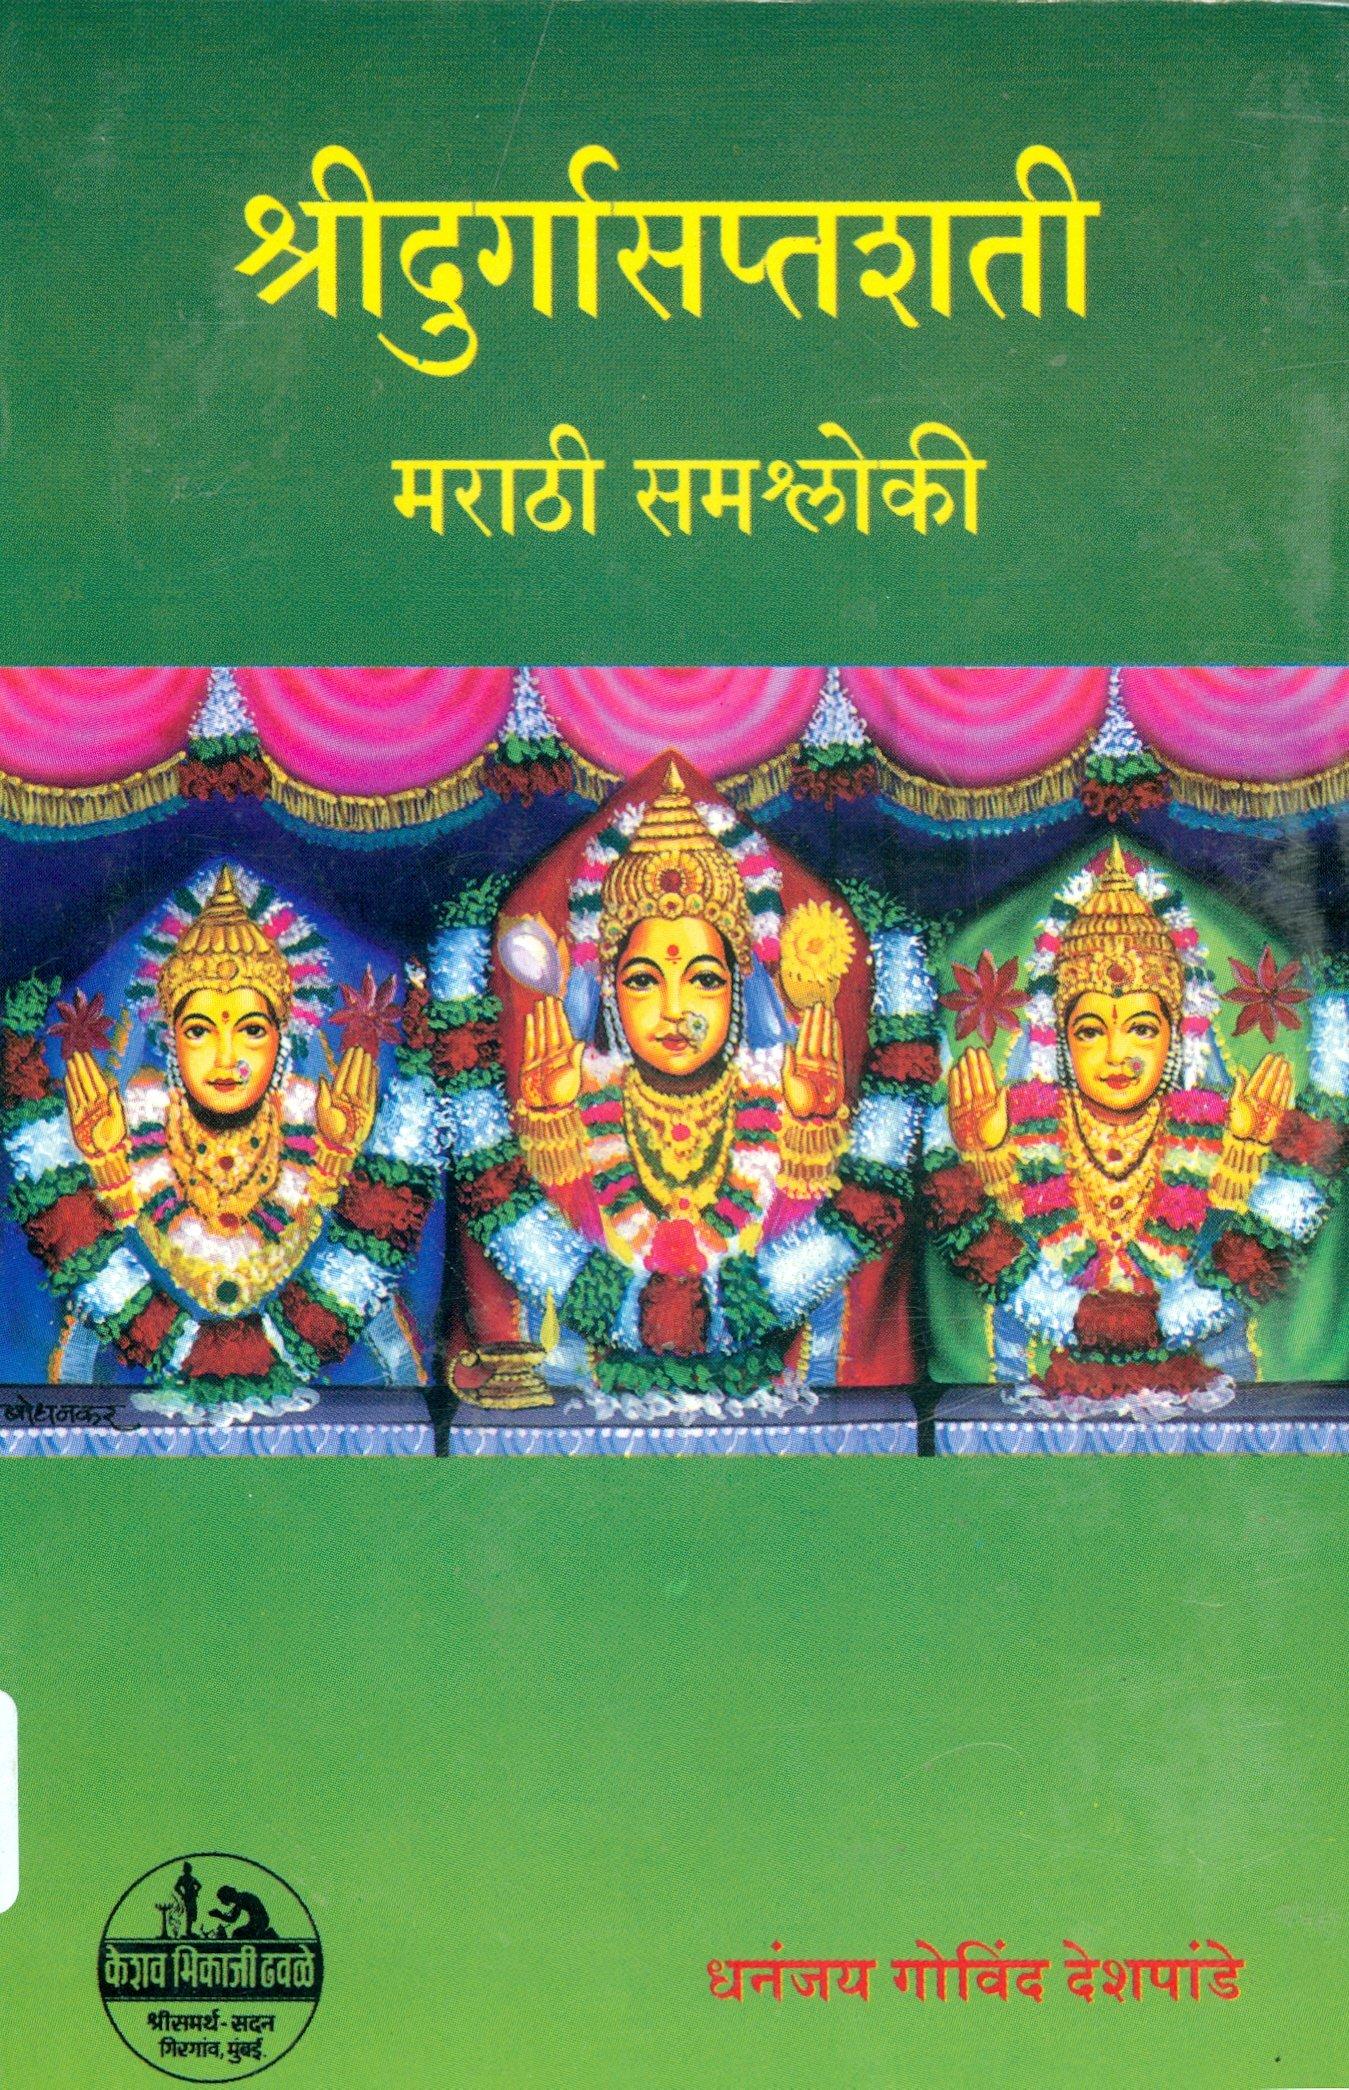 Durga saptashati telugu pdf free download by teddiscdestplat issuu.